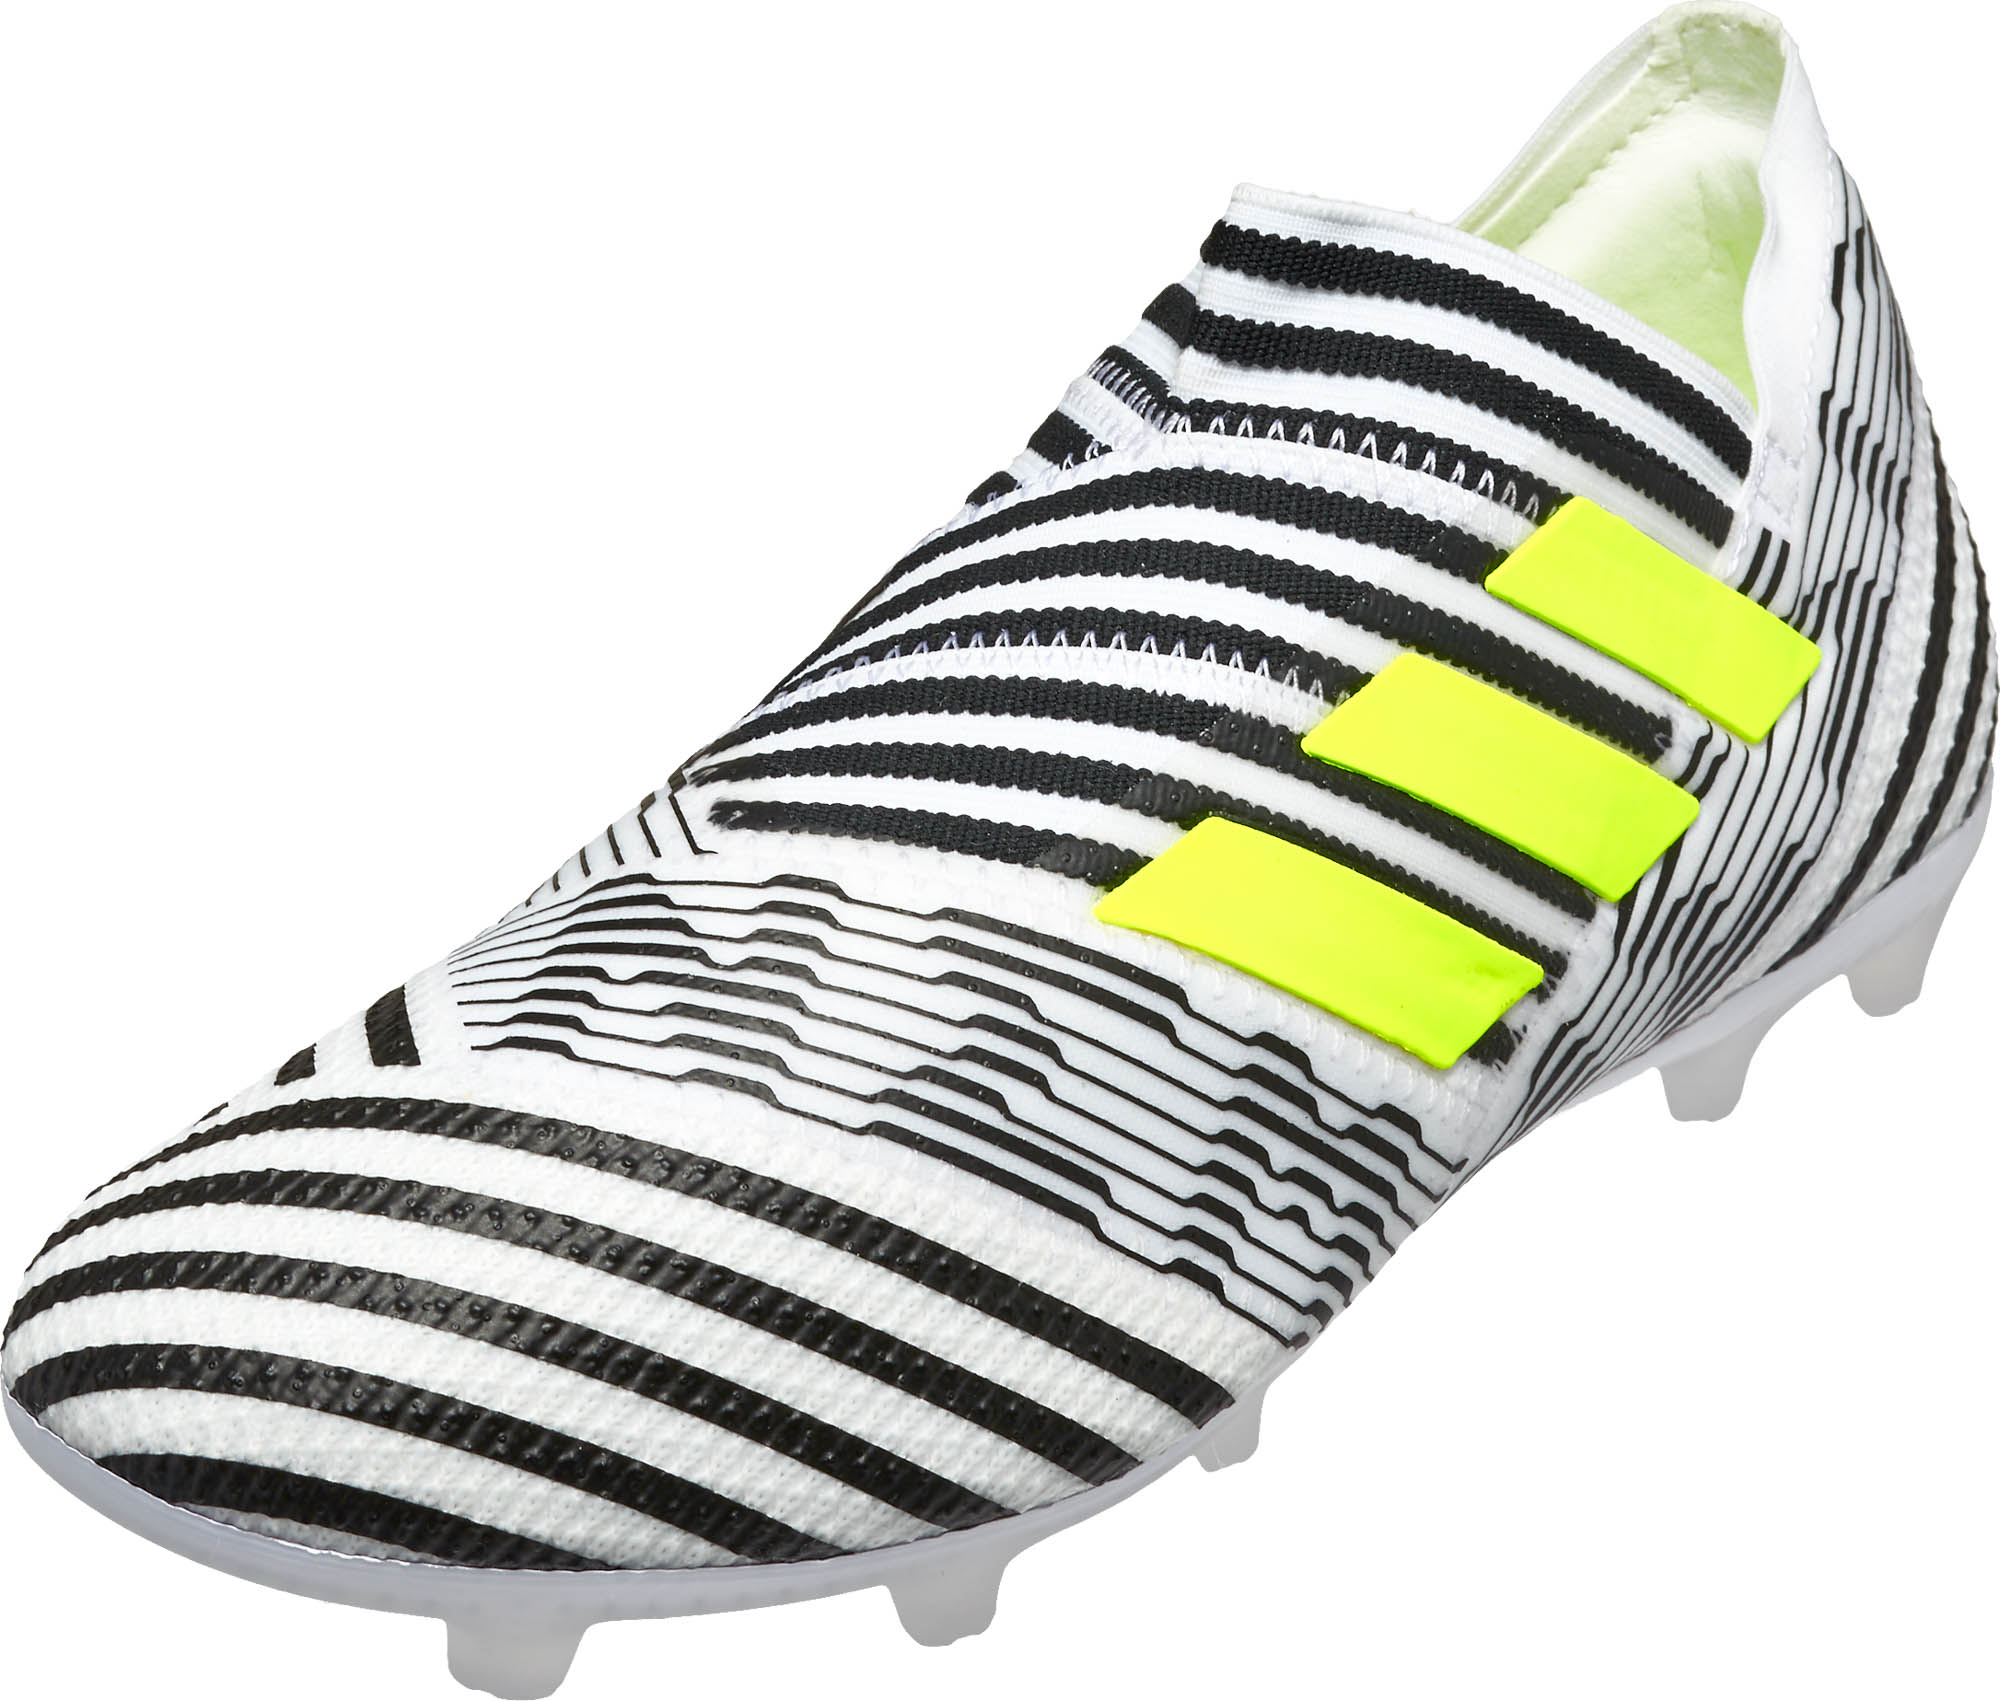 Kids adidas Nemeziz 17+ 360Agility FG Soccer Cleats – White   Solar Yellow f3b2b1818